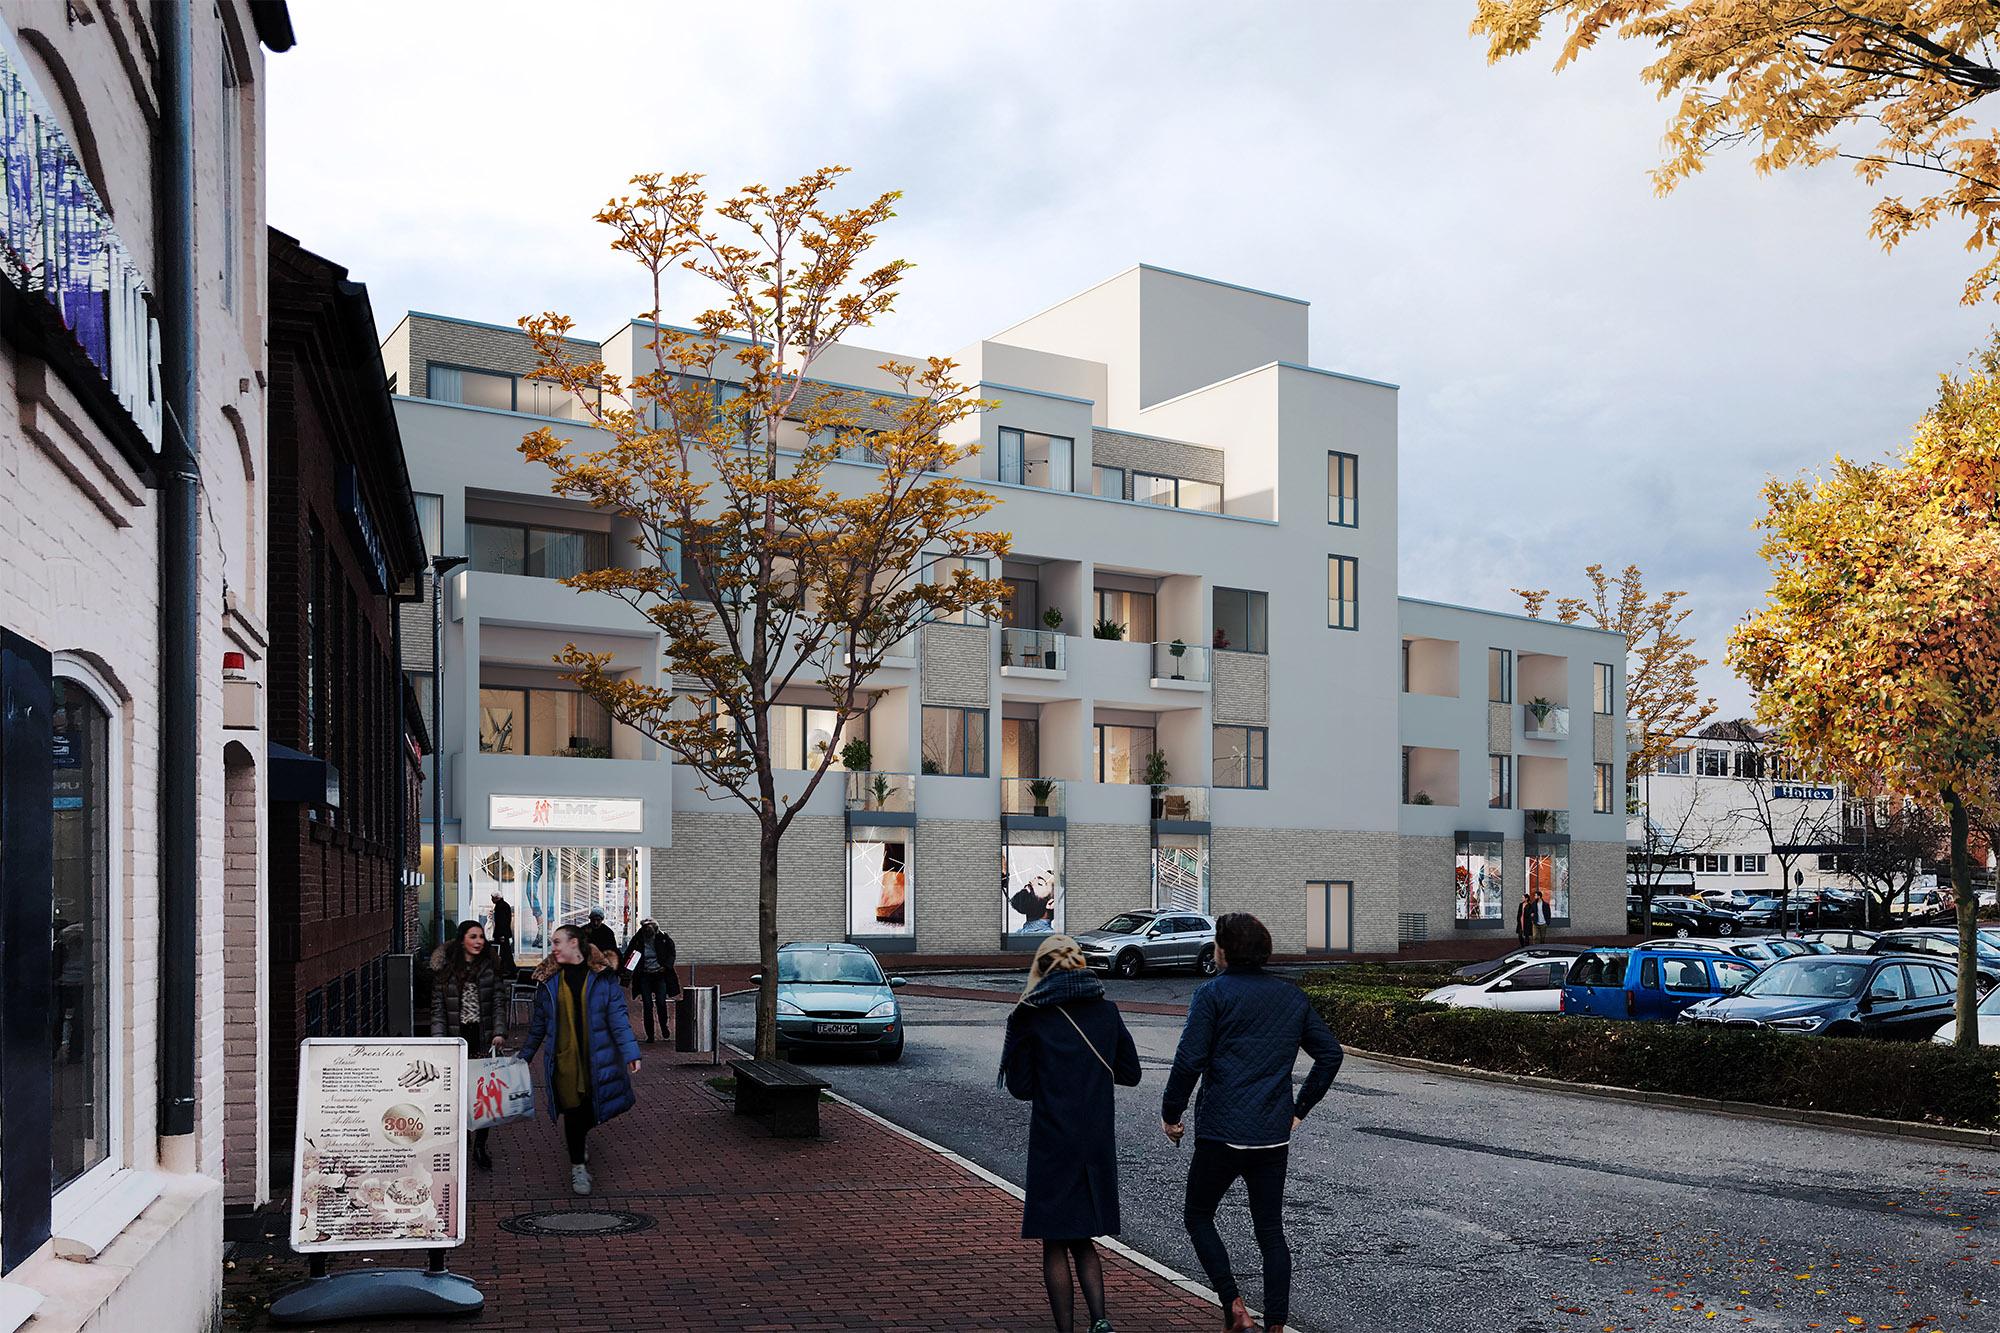 mojoimages architekturvisualisierung Architekturbuero Minde Vermarktung Kaufhaus Eutin 2017